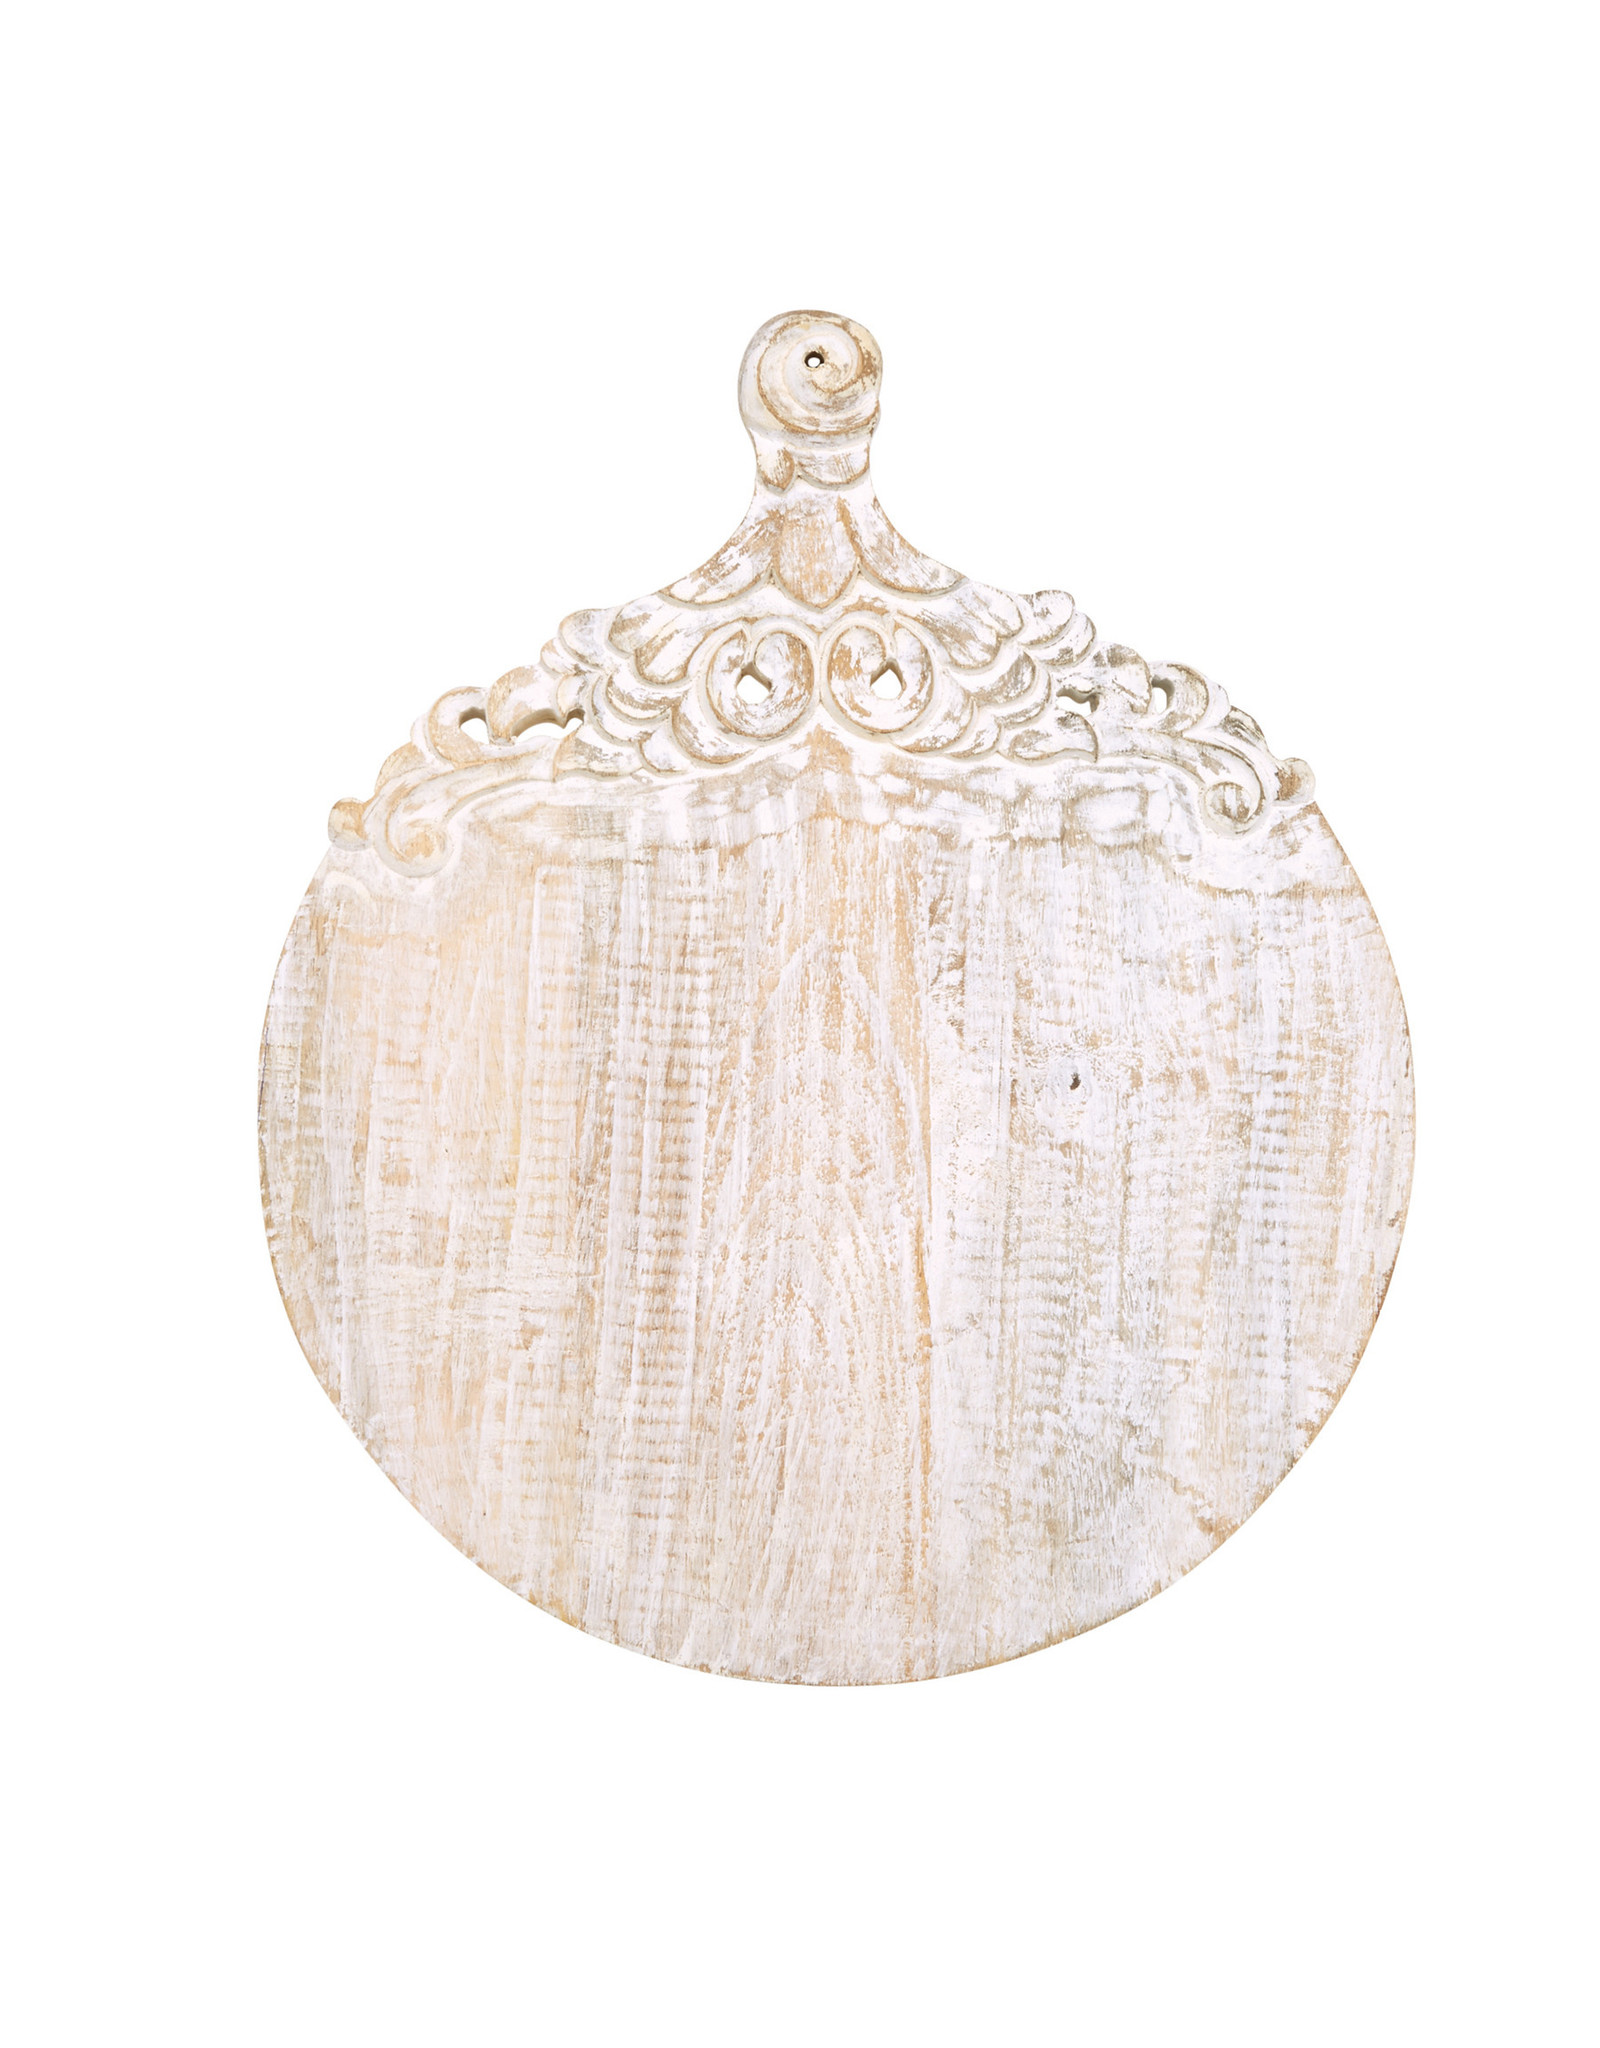 Circle Carved Wood Board